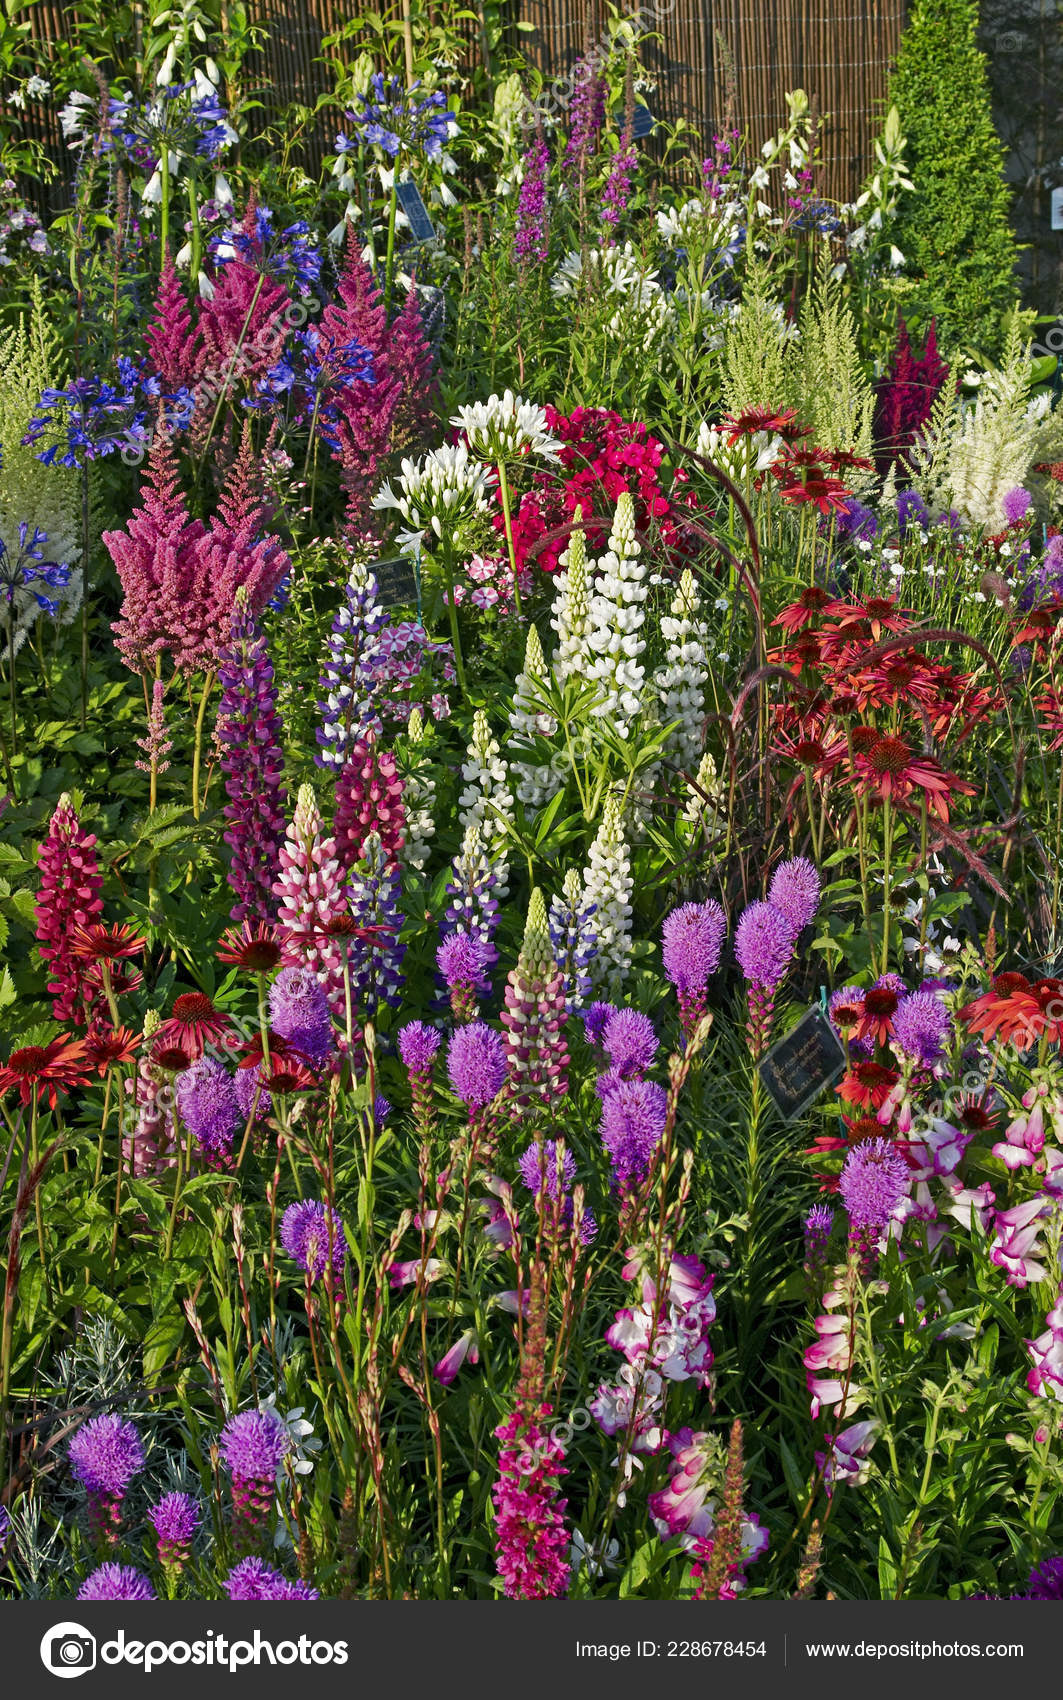 Pink And Purple Border Garden Plan Colourful Display Flowering Border Plants Country Garden Stock Photo C Gardenguru 228678454